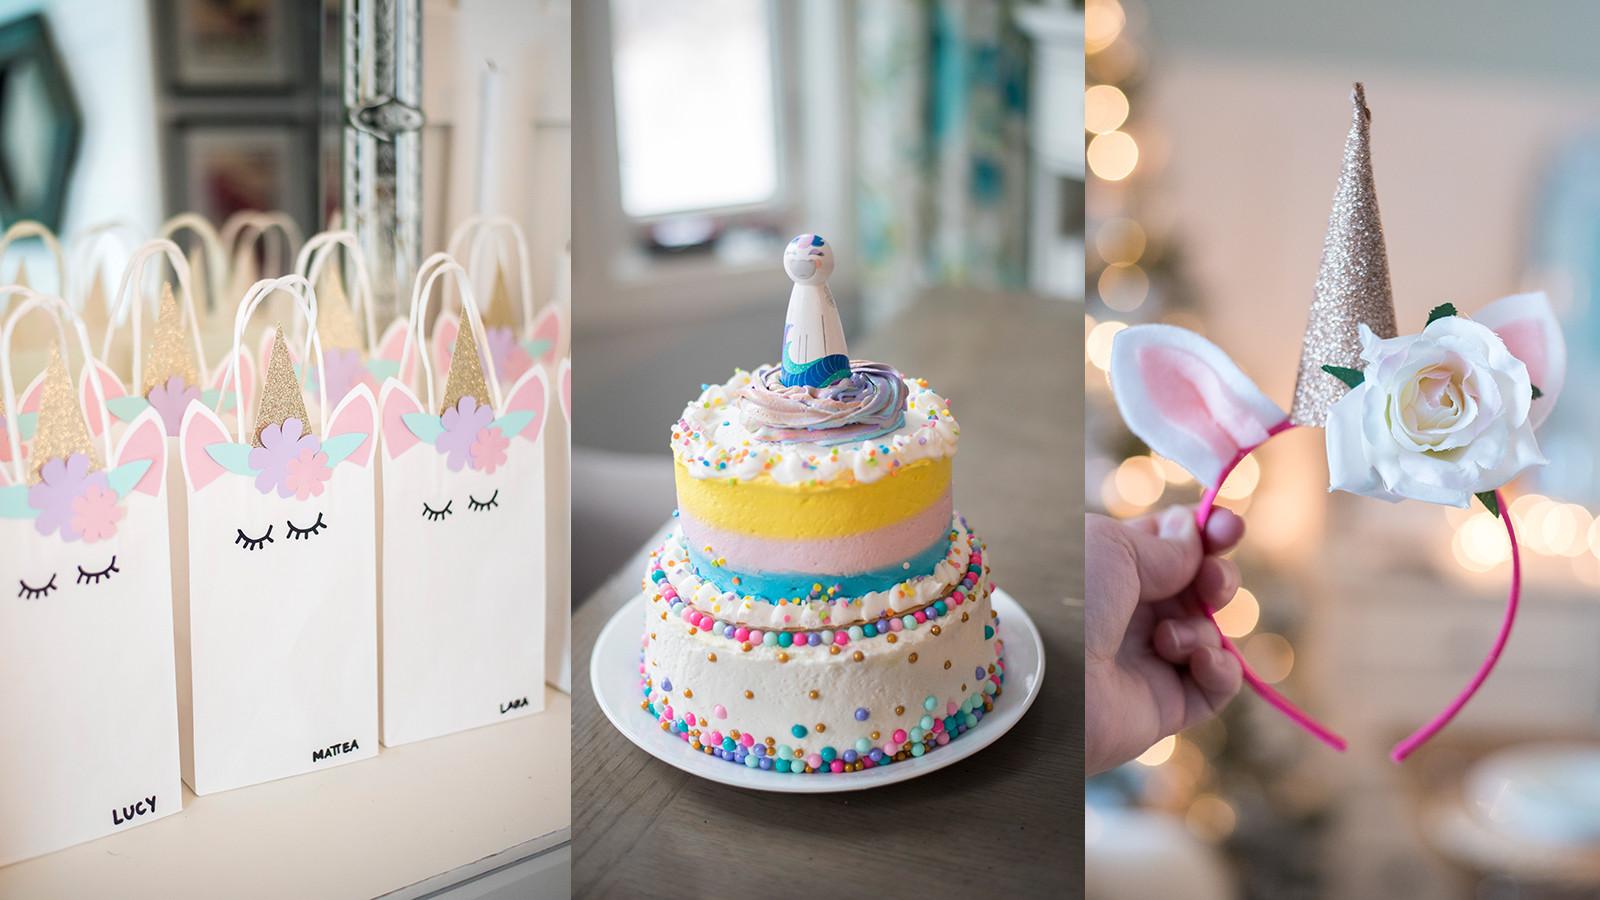 Diy Unicorn Birthday Party Ideas  DIY Unicorn Party Ideas